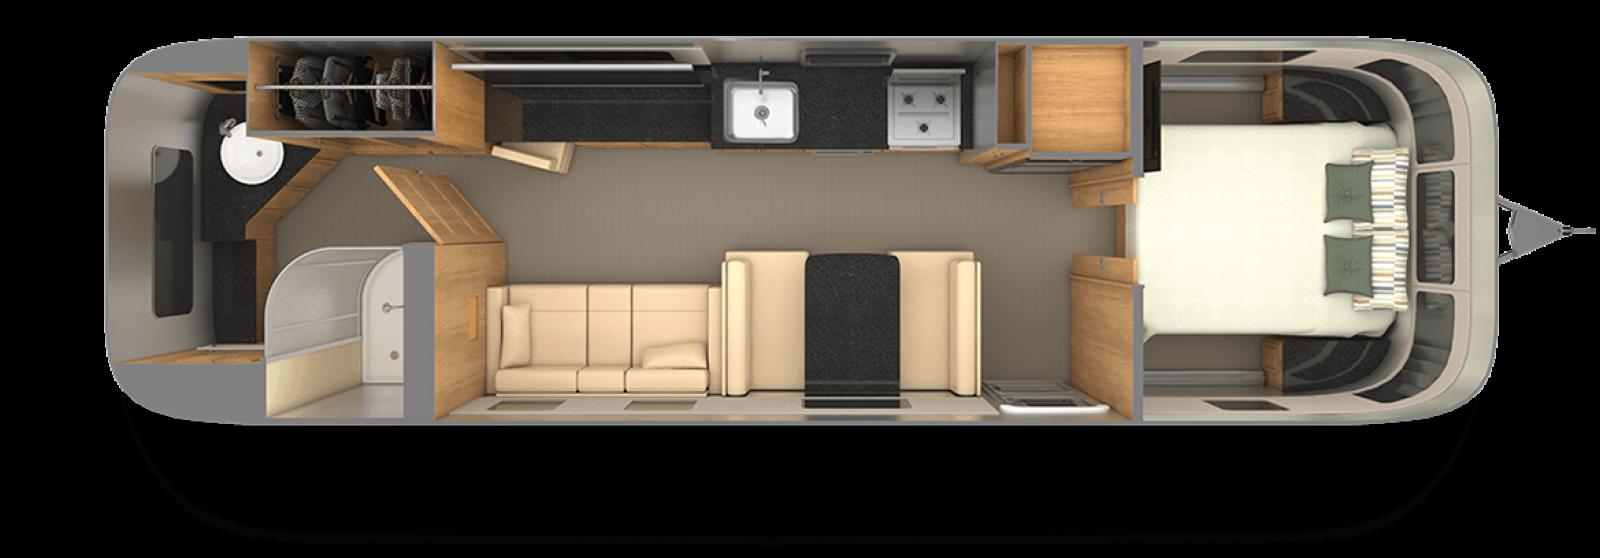 Classic-Floorplan-33FB-wShadow-NEW